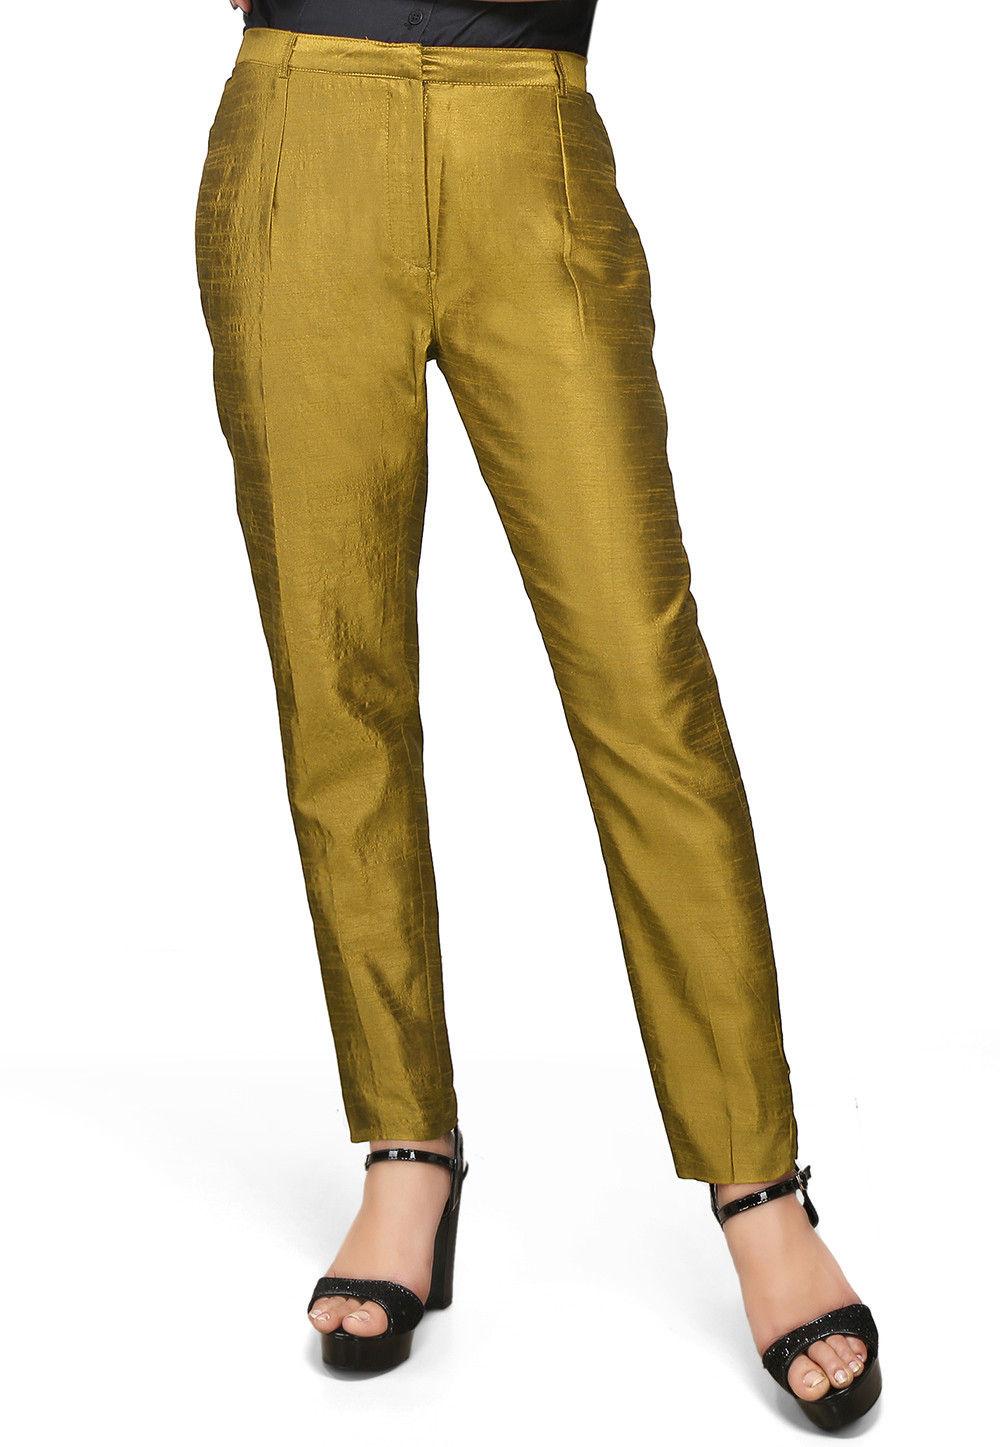 Art Silk Straight Pant in Mustard